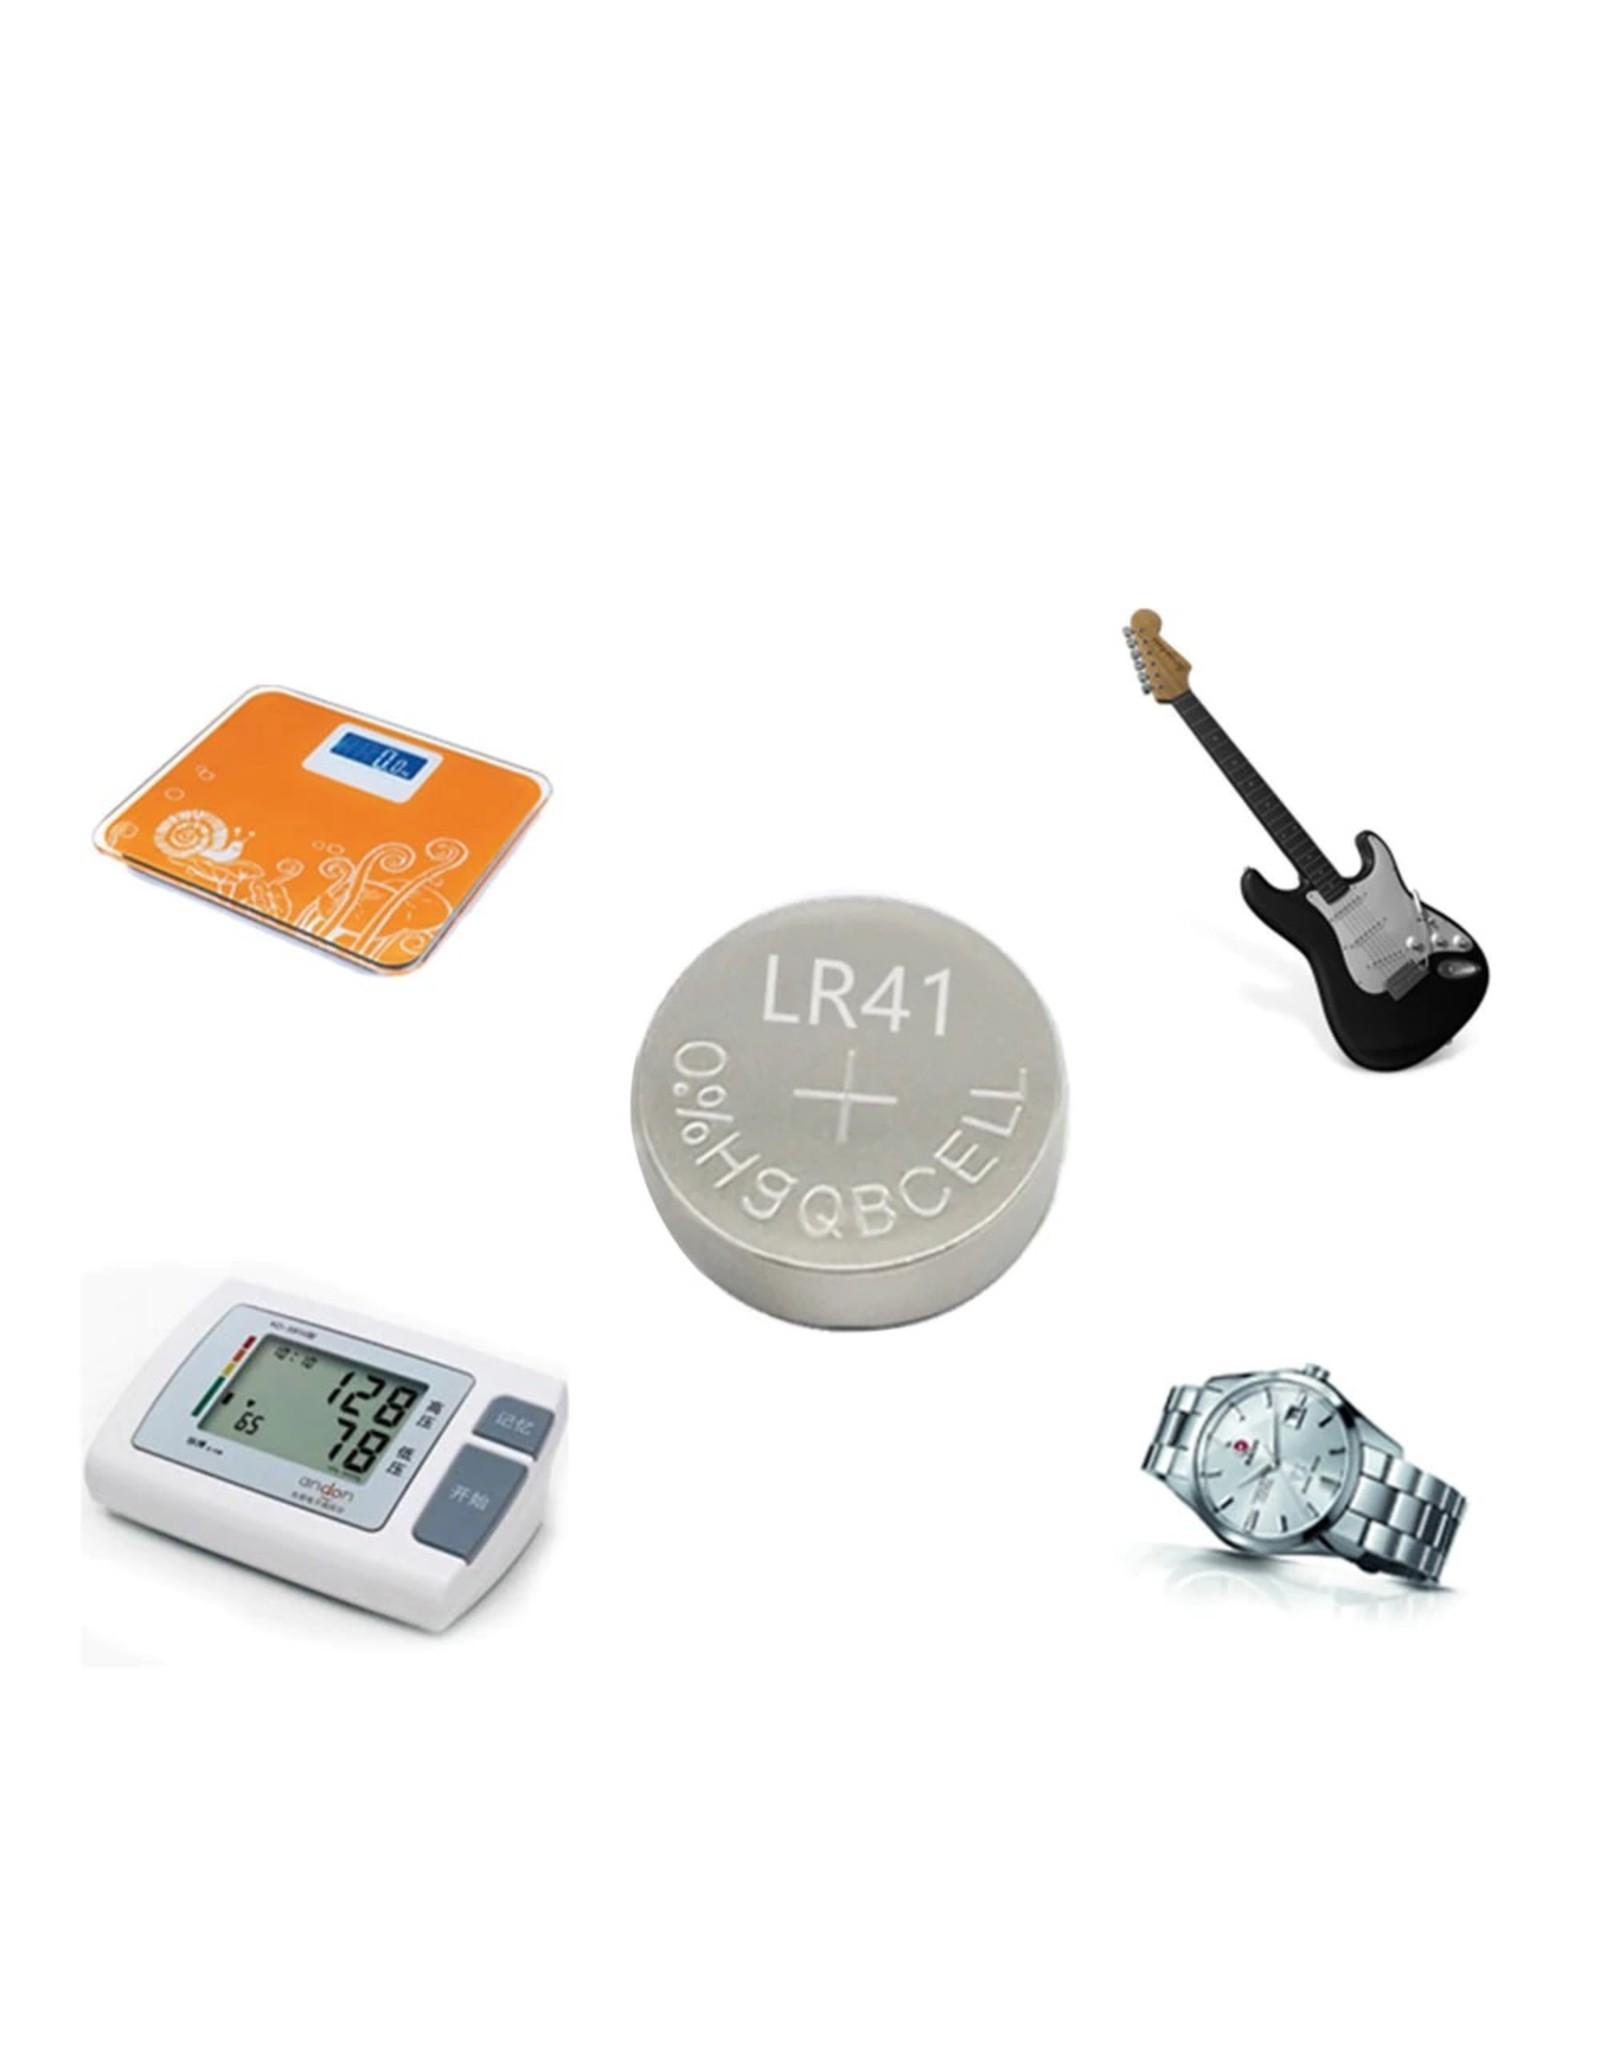 LR41 AG3 SR41W 392192 GP192A LR736 Button Watch Battery Cell Cion-batterijen voor zaklampen, speelgoed, horloges